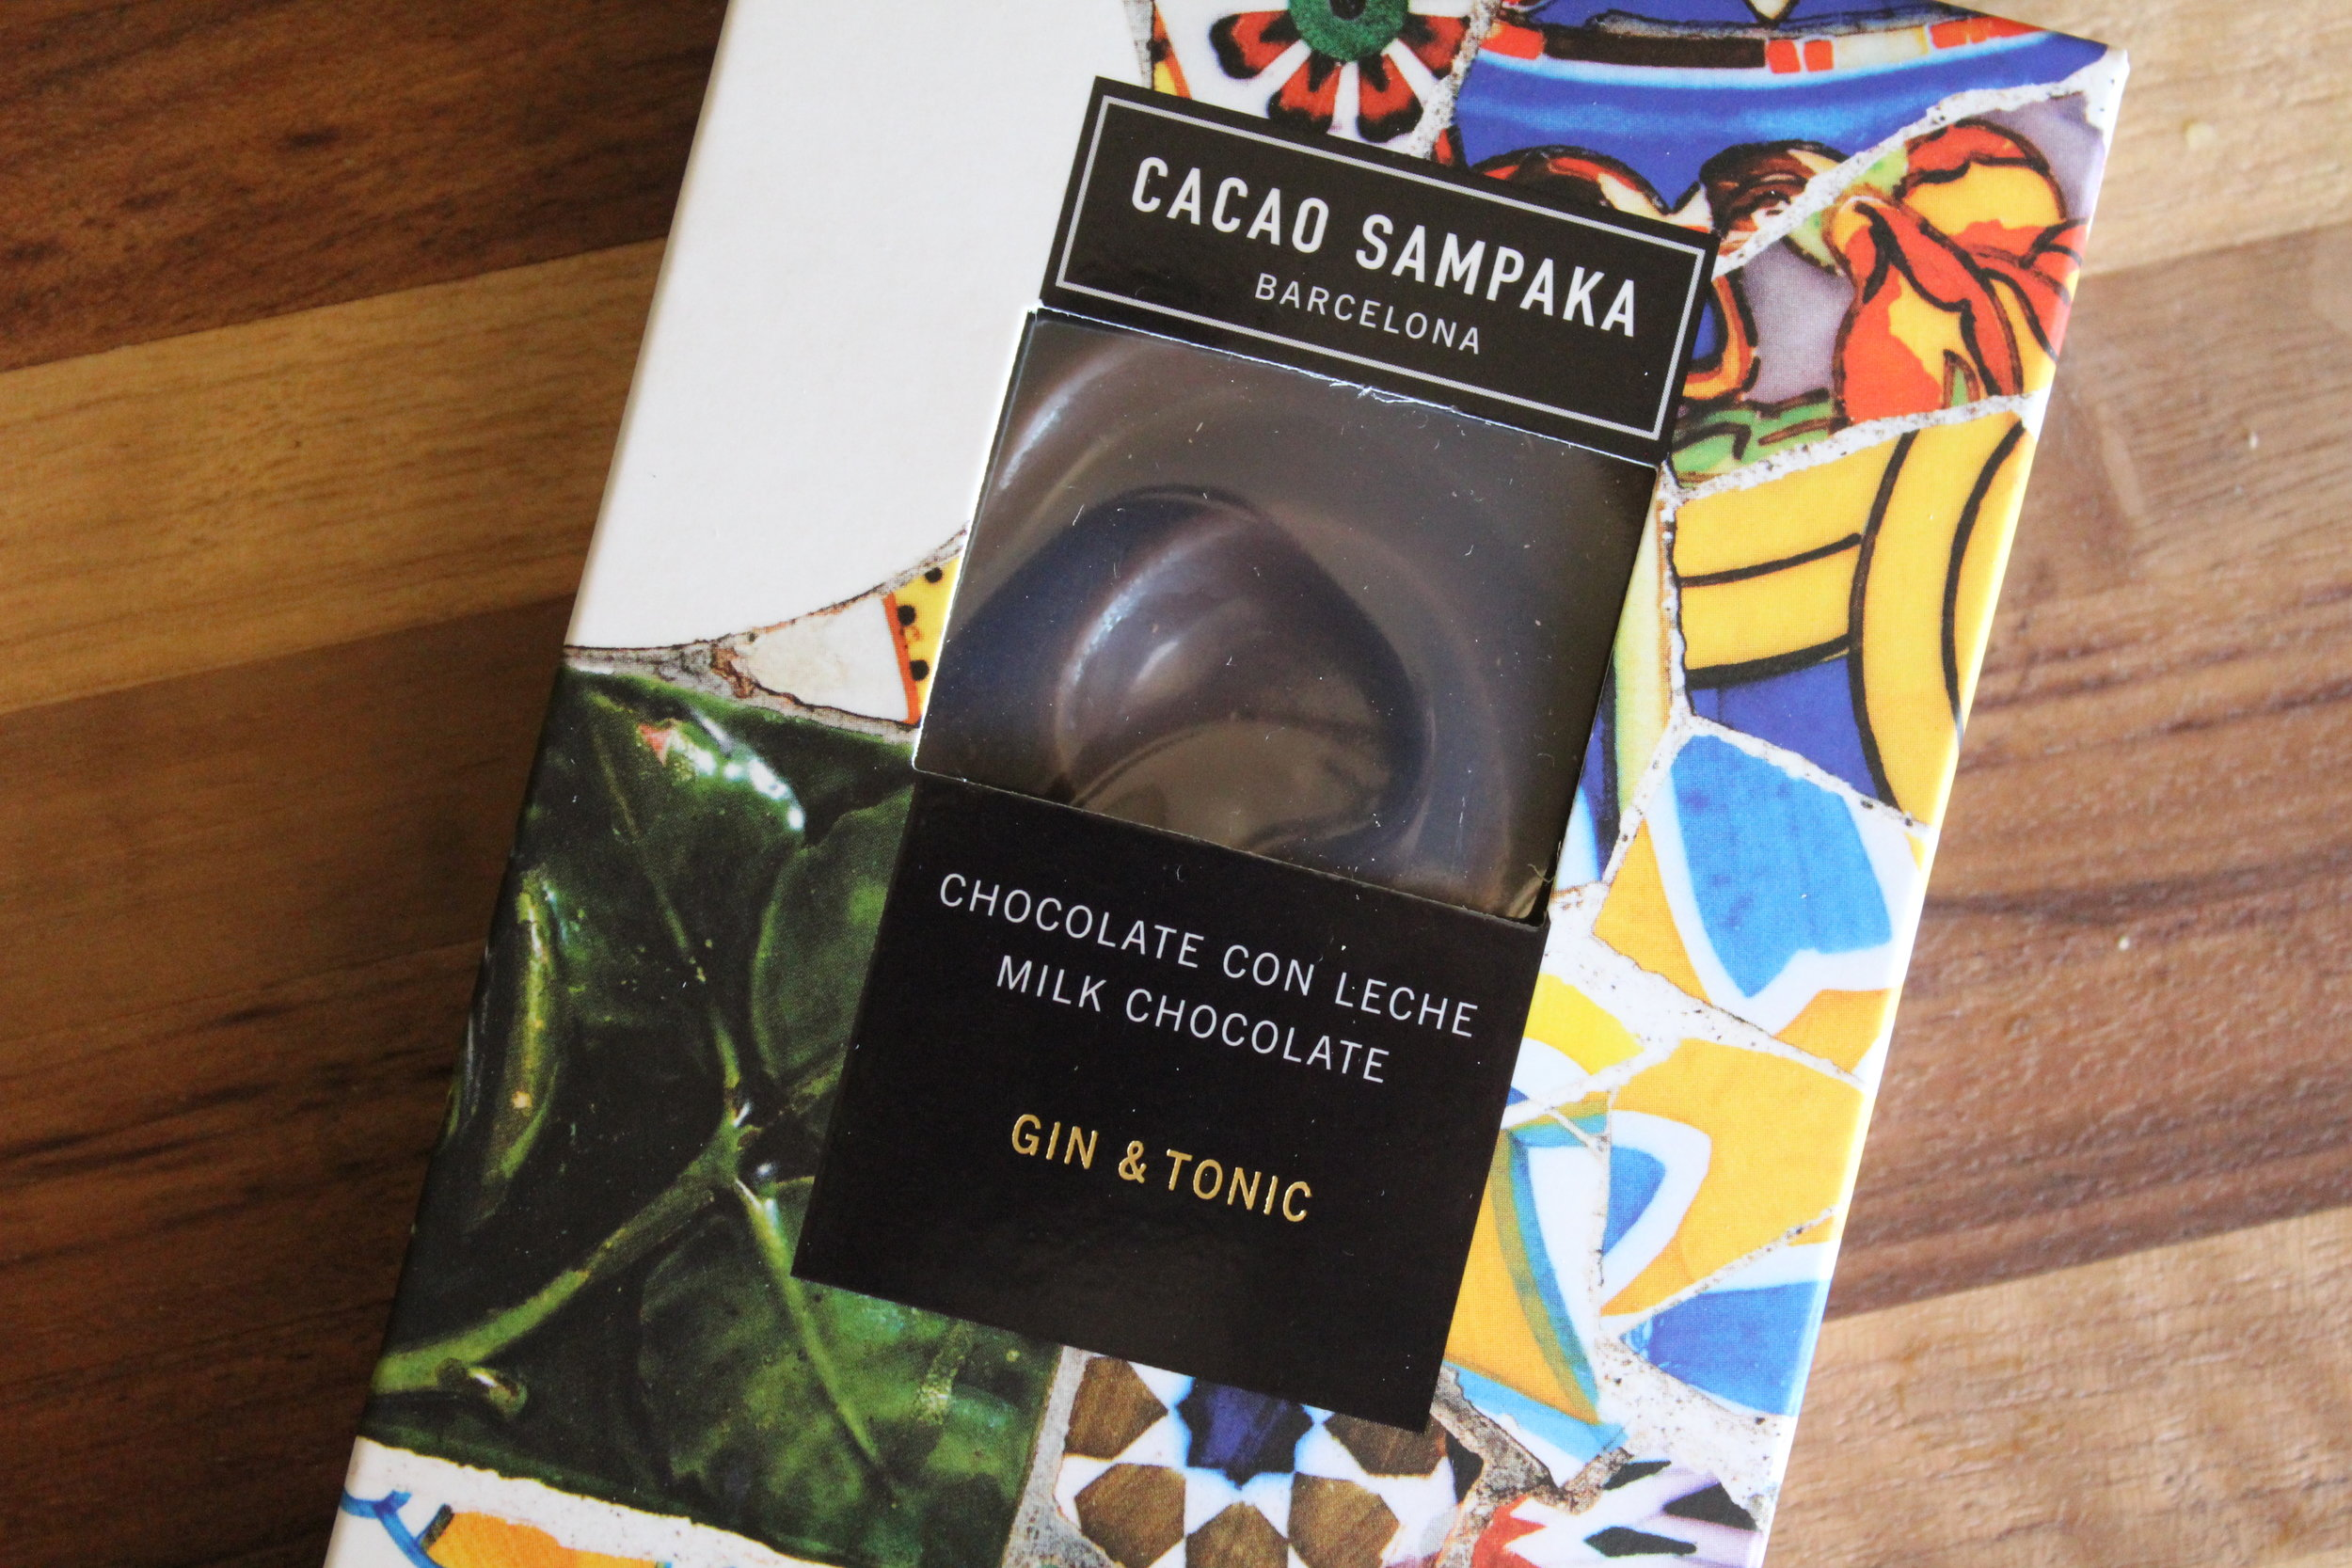 Gaudi Cacao Sampaka Gin and Tonic Chocolate Bar